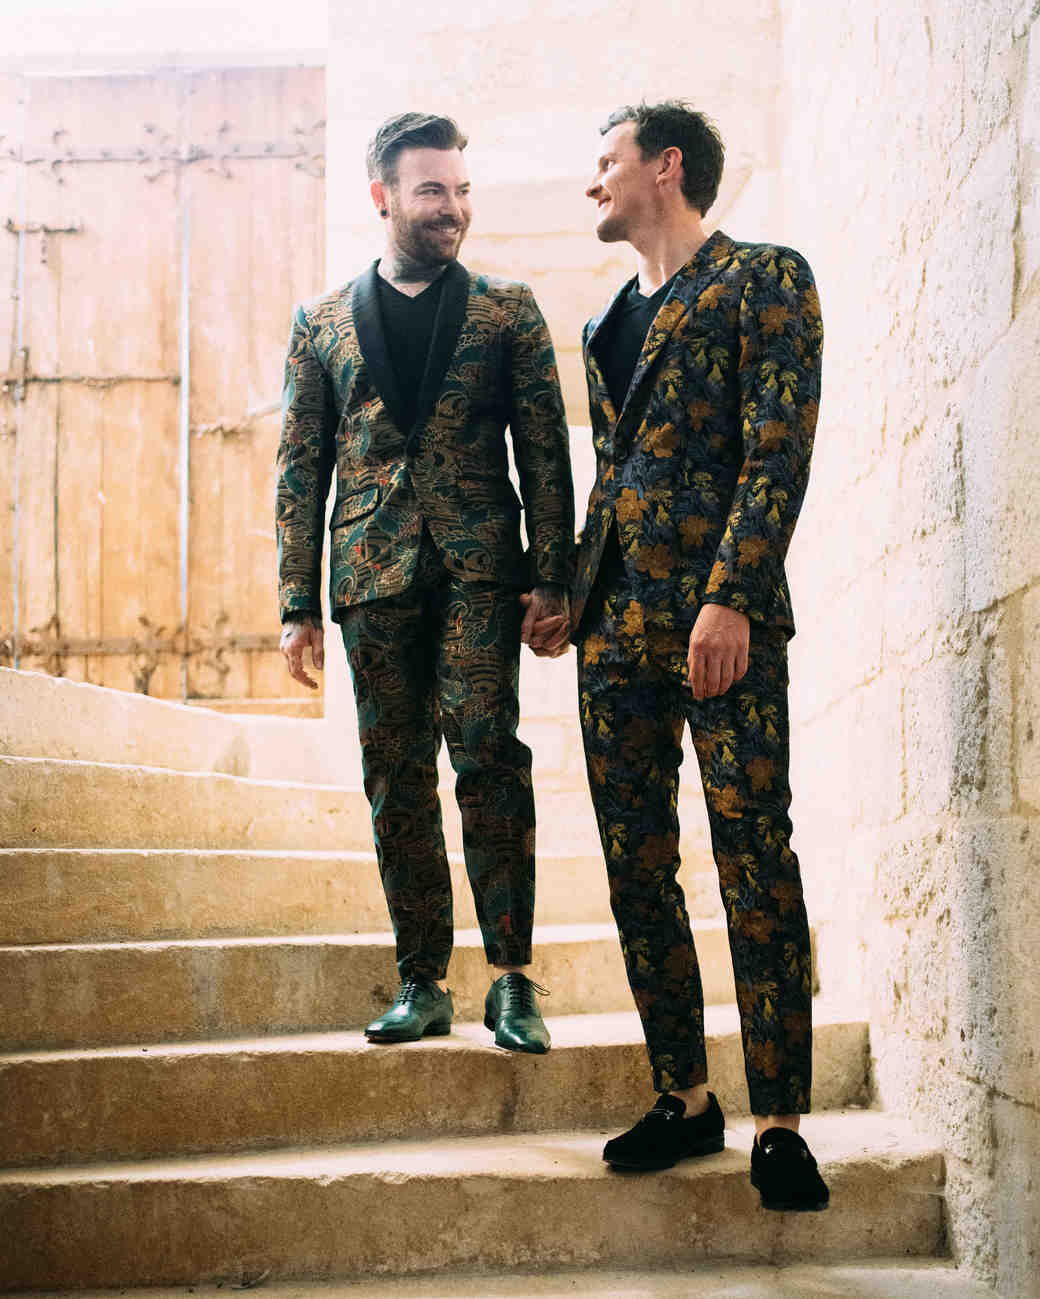 thomas jared wedding couple holding hands on stone stairs